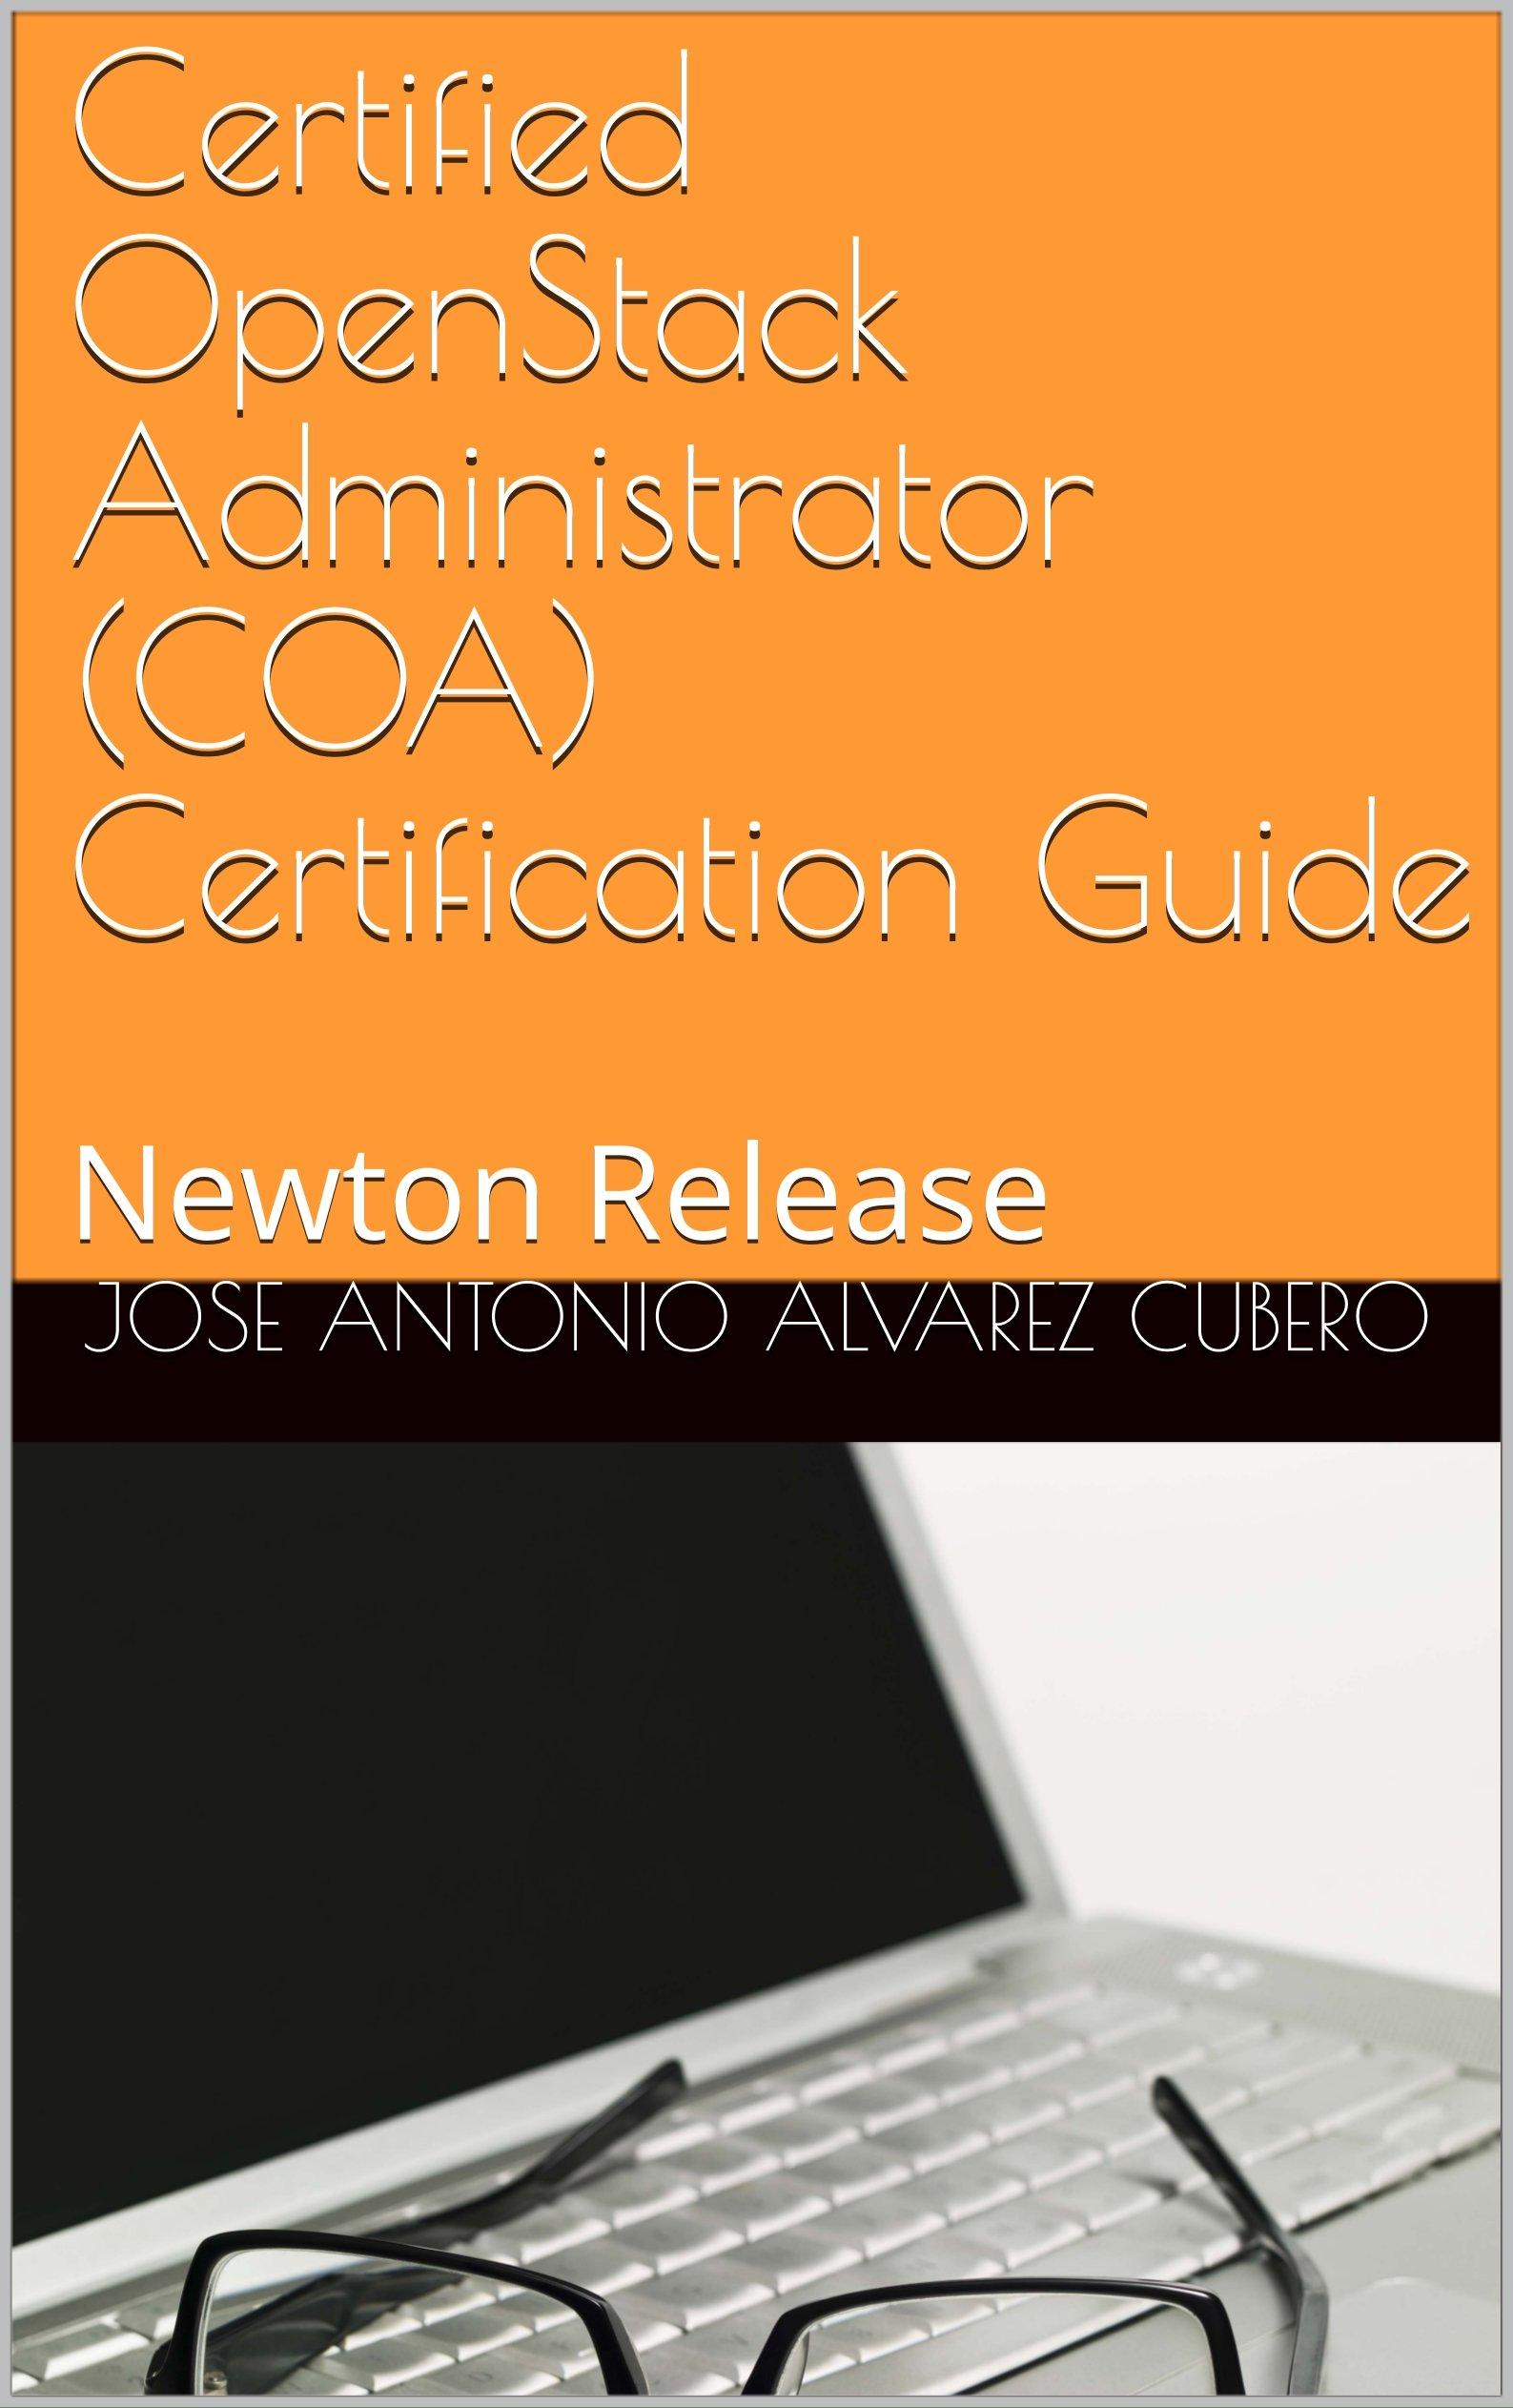 Certified OpenStack Administrator (COA) Certification Guide: Newton Release por Jose Antonio Alvarez Cubero